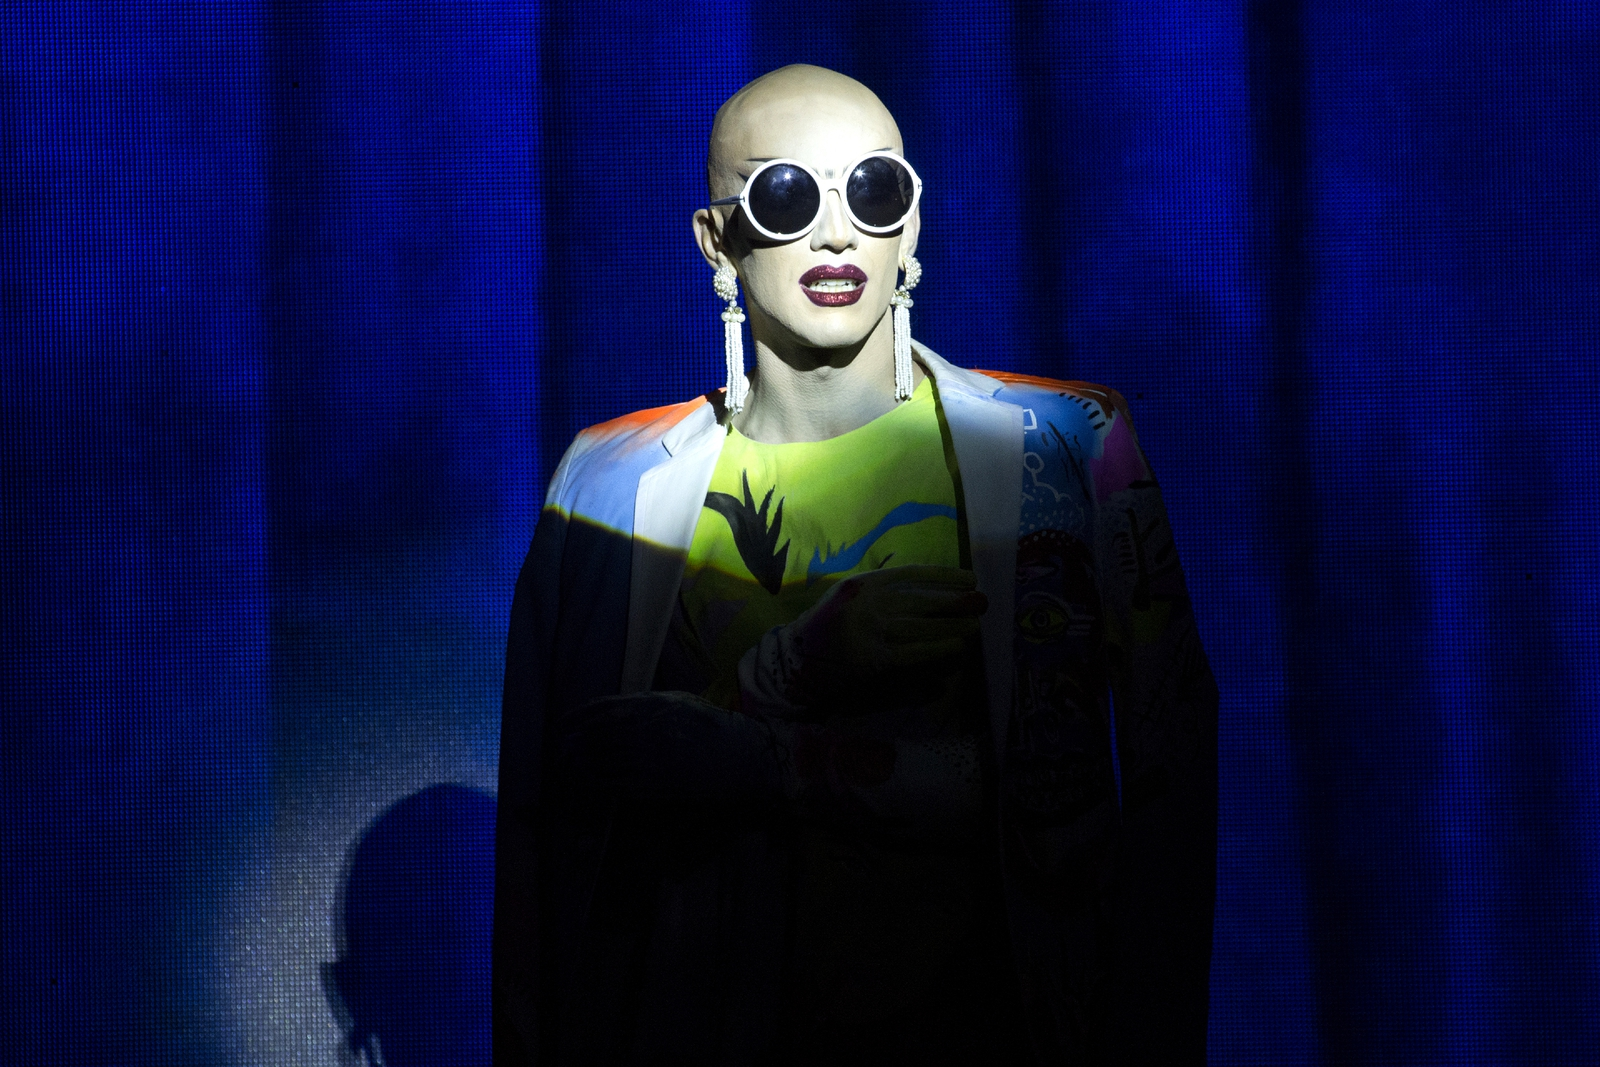 Image - Winner of RuPaul's Drag Race season 9 Sasha Velour Photo: Getty Images